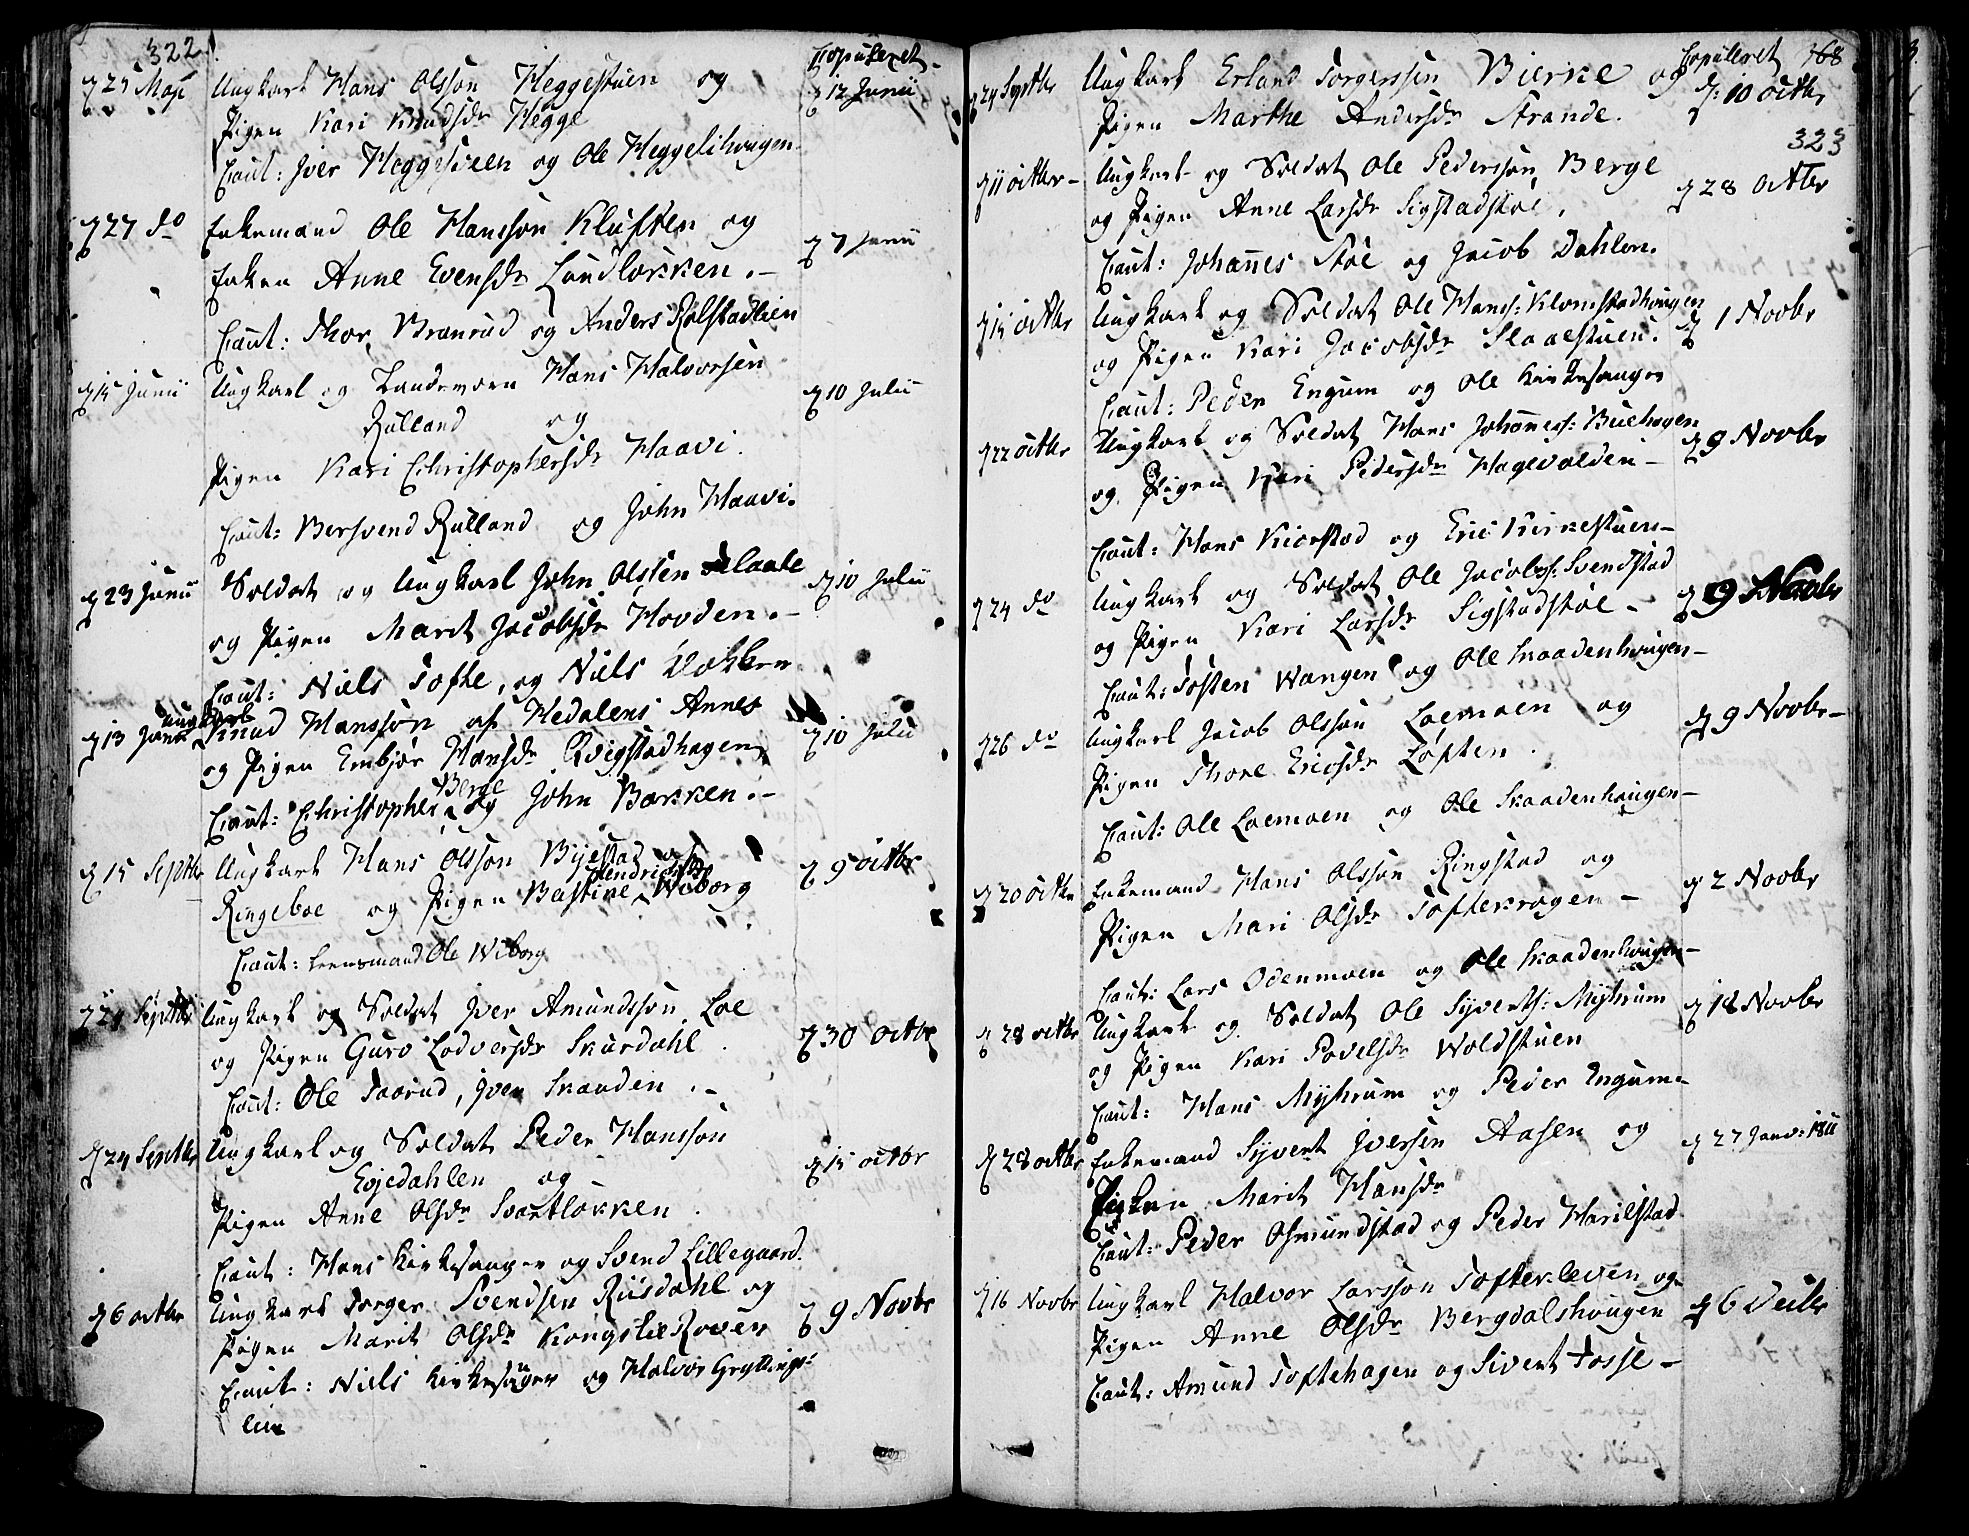 SAH, Fron prestekontor, H/Ha/Haa/L0001: Ministerialbok nr. 1, 1799-1816, s. 322-323